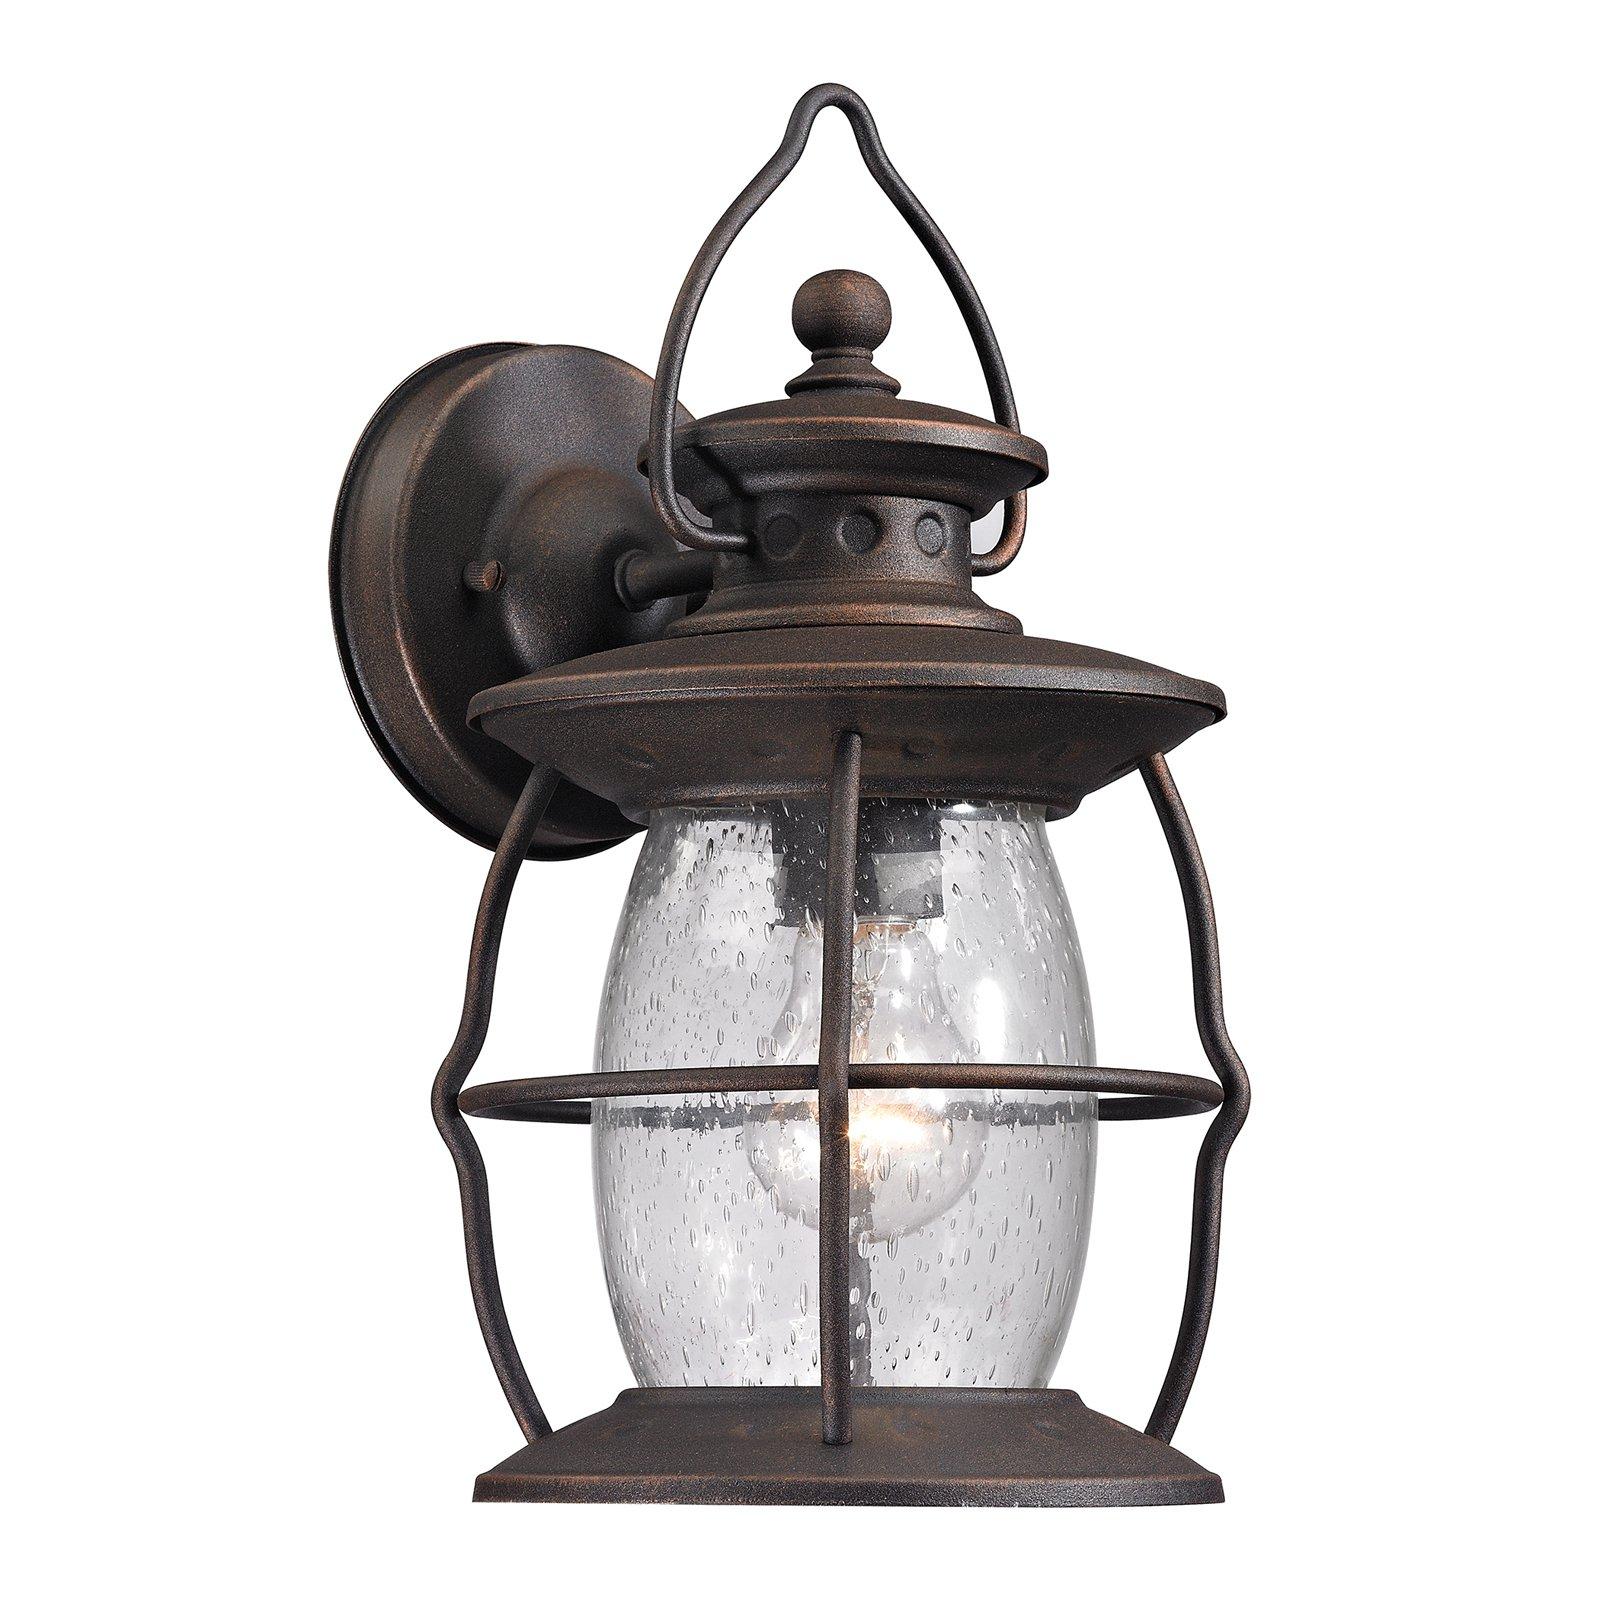 ELK Lighting Village Lantern 4704 1-Light Outdoor Wall Sconce